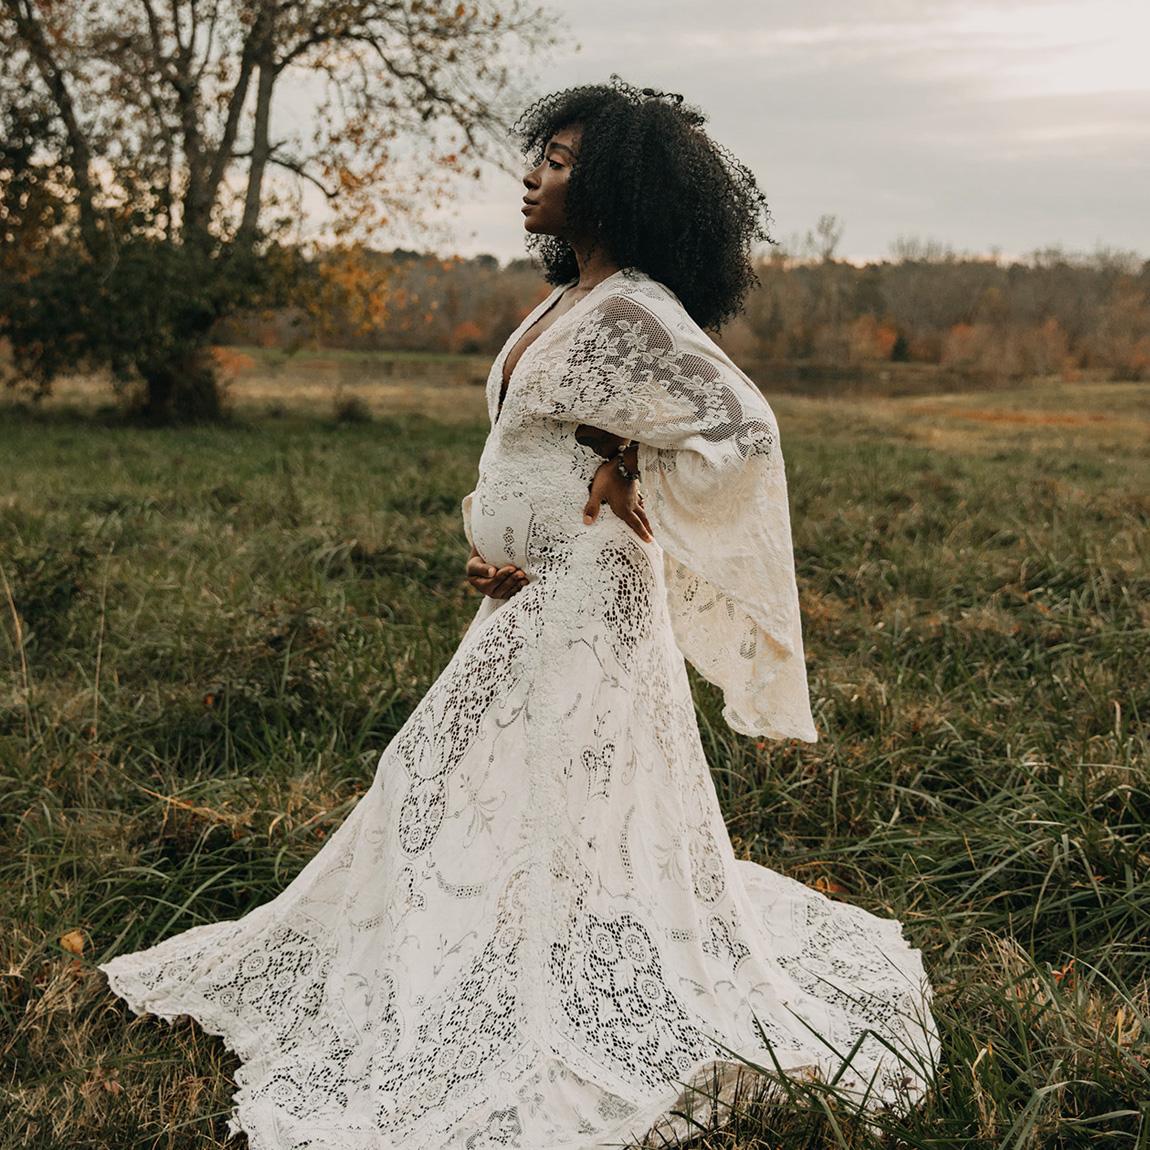 Maternity Wedding Dresses for Pregnant Brides